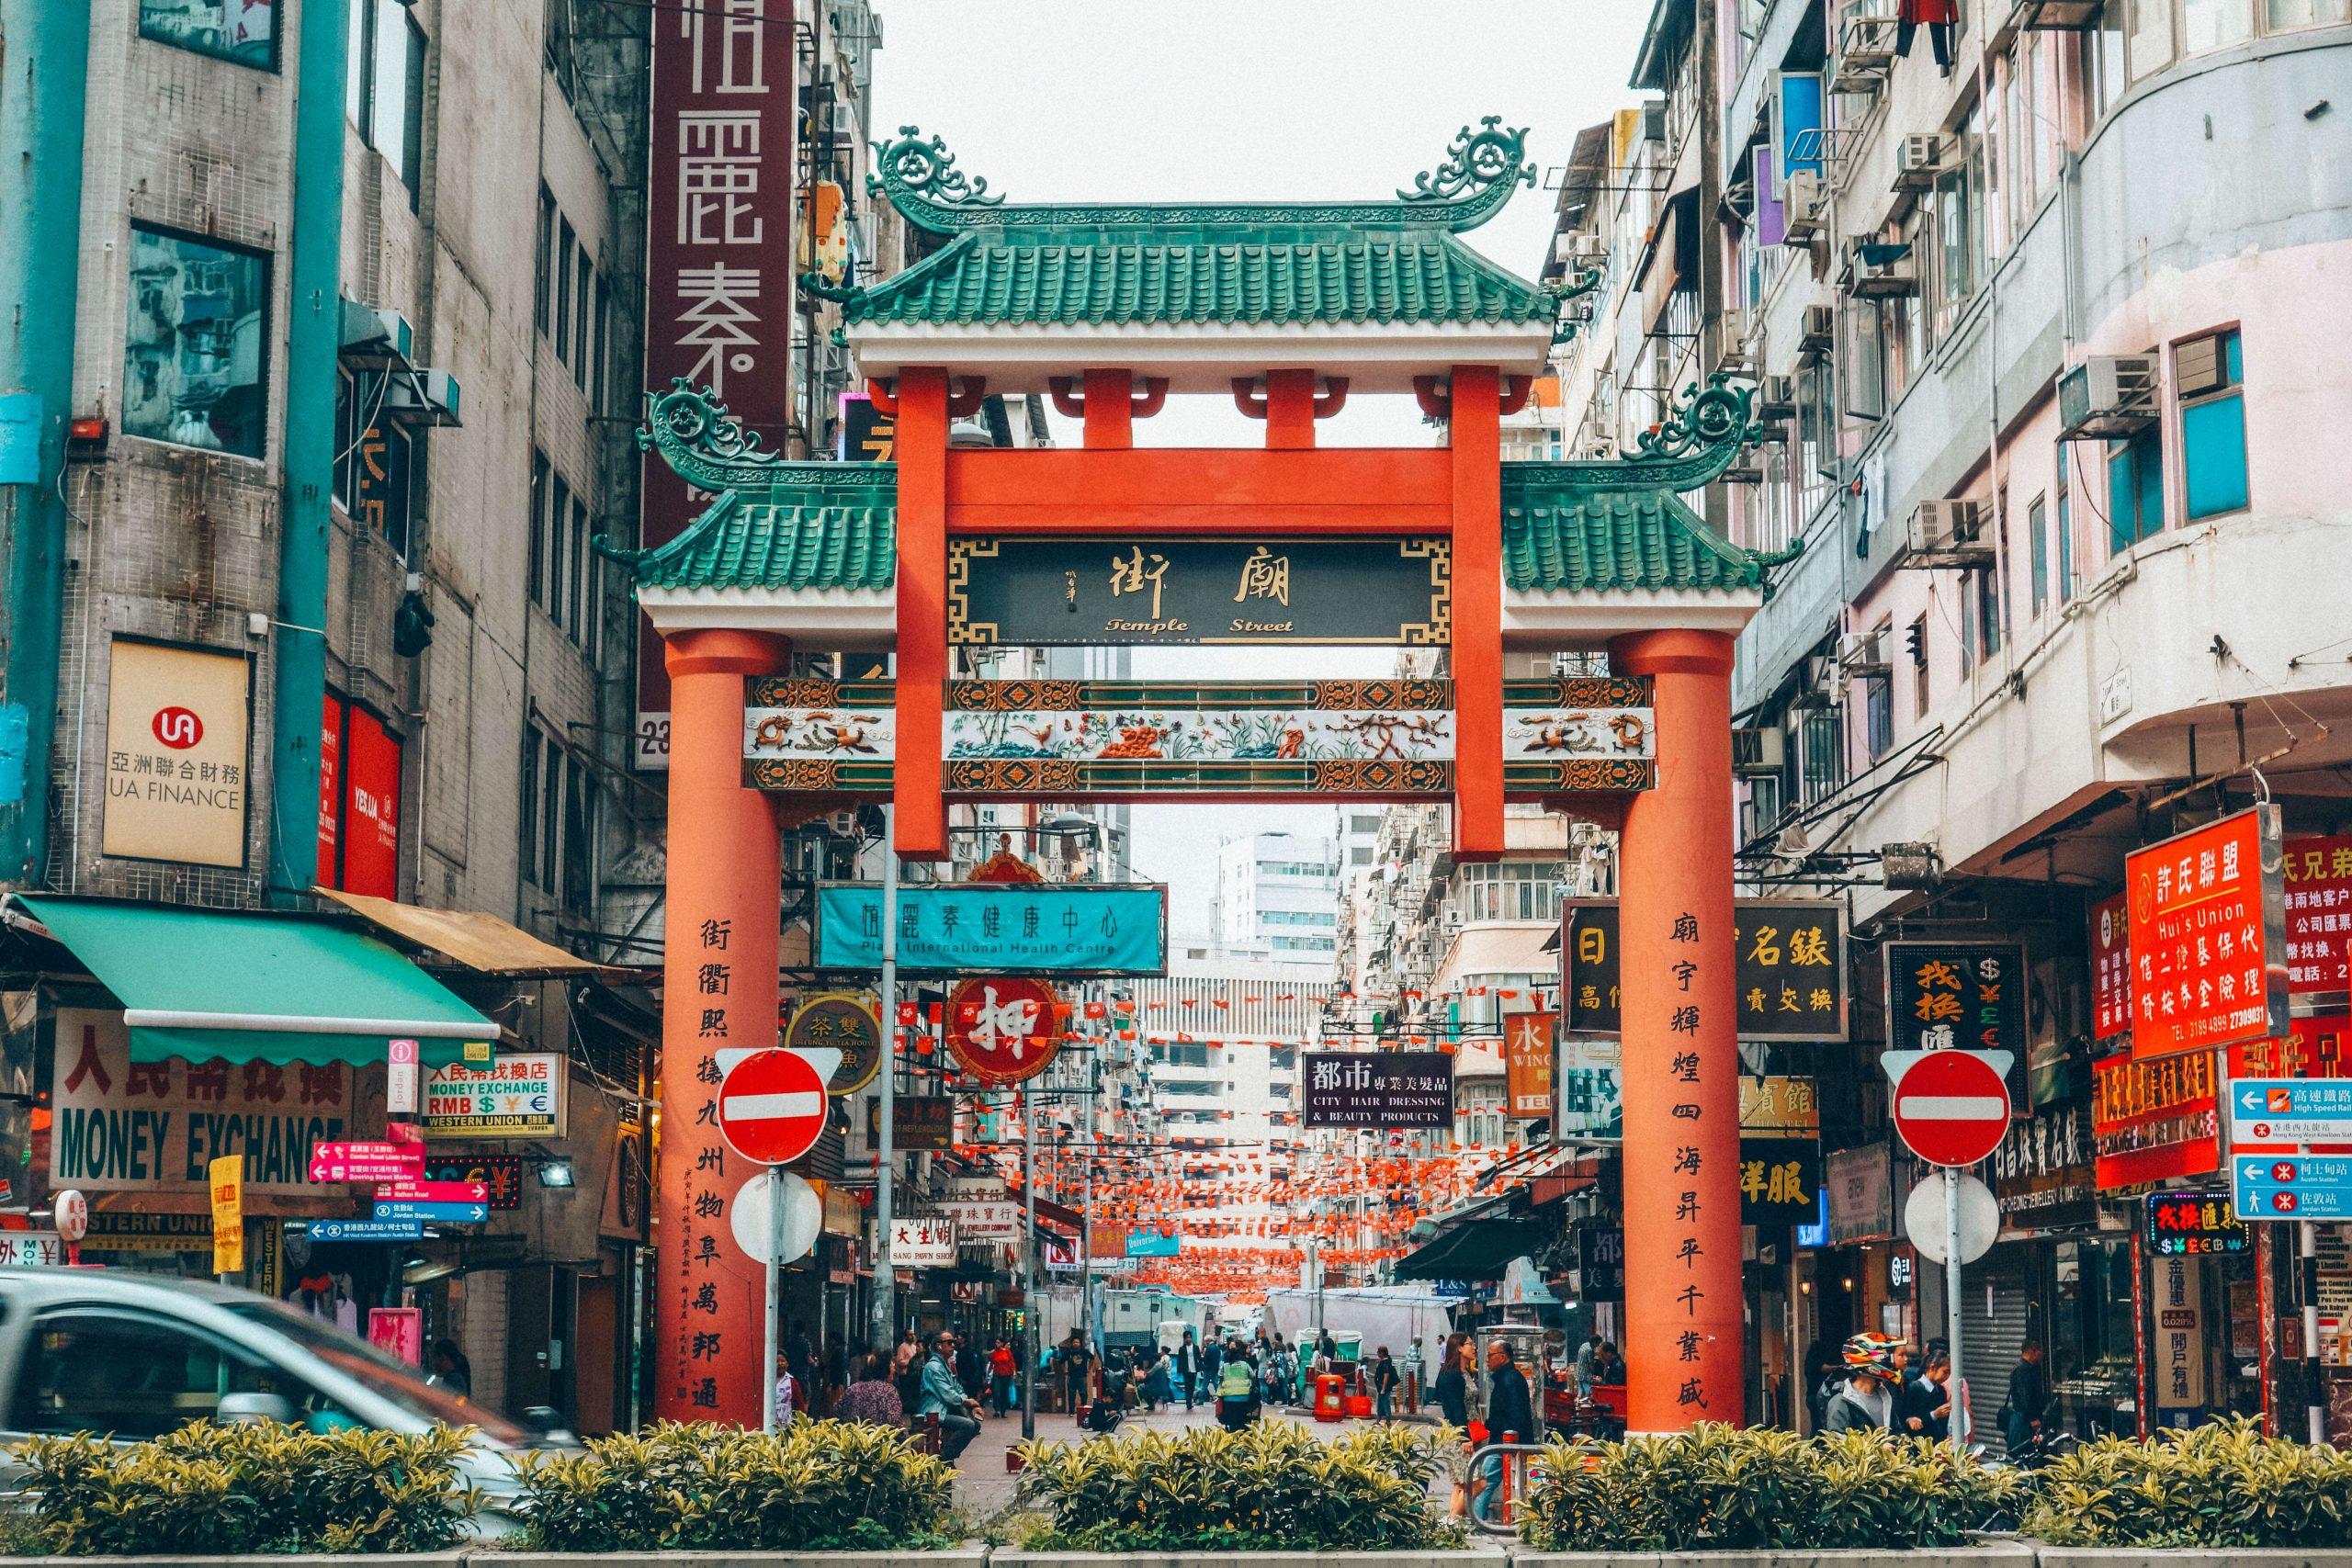 Temple street Hong Kong